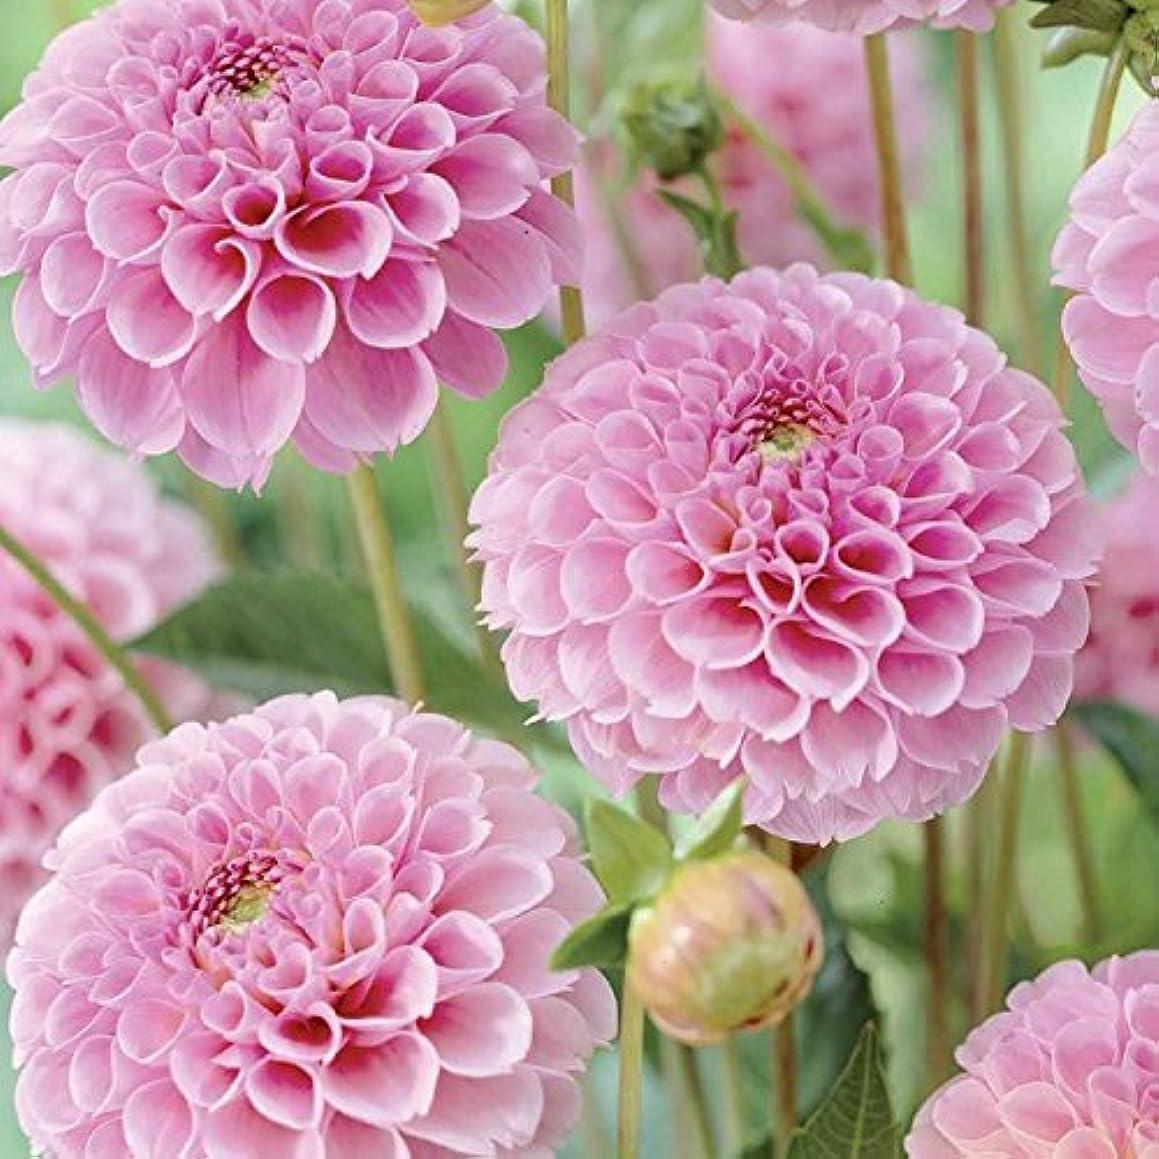 Flower Seeds Dahlia-Pompon Rose Flower Seeds for Home garden-100 Seeds by